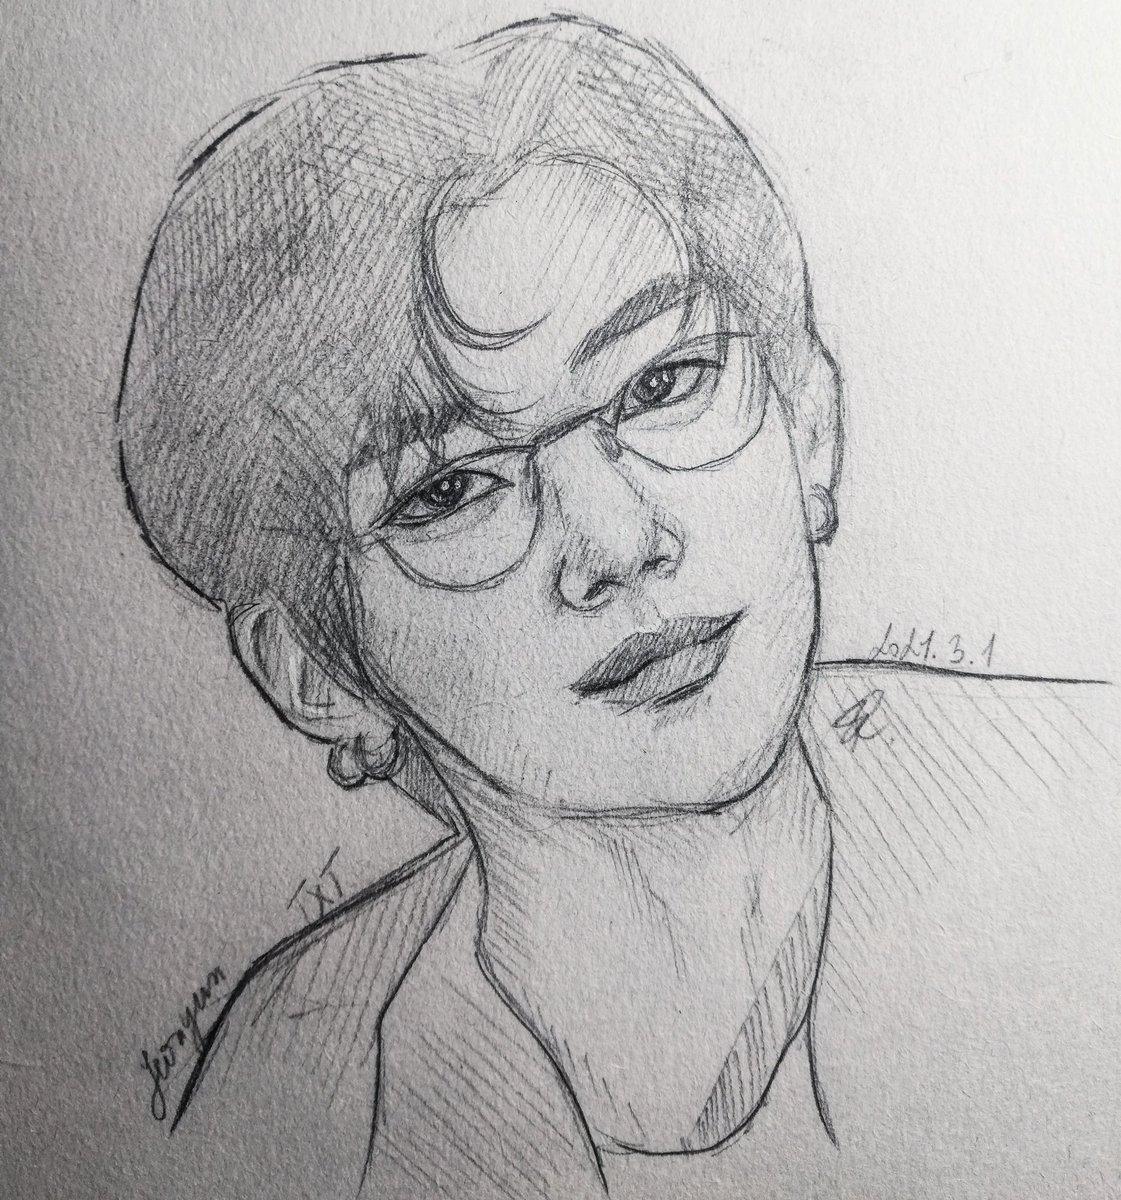 Quick sketch of Yeonjun #yeonjun #yeonjuntxt #txt #togetherxtomorrow #art #artist #sketch #sketchbook #draw #pencildrawing #bts #bighit #artoftheday #dailyart #taehyung #jungkook #jimin #suga #jhope #jin #rm #BTS_twt #TXT_YEONJUN #TXTfanart #TXT_연준